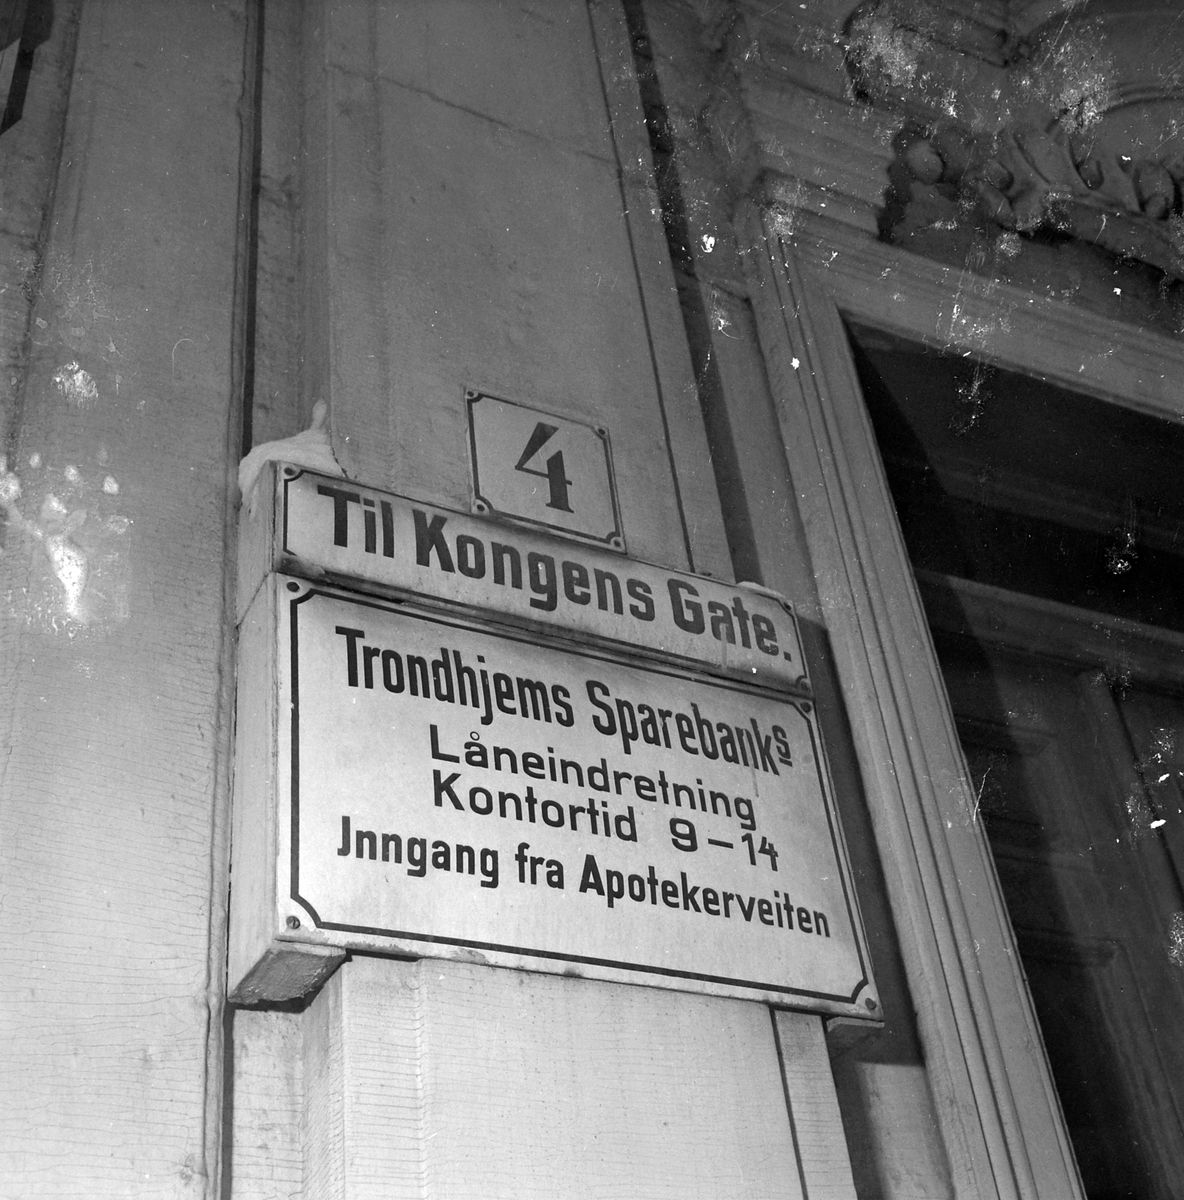 Trondhjems Sparebanks Låneinnretning